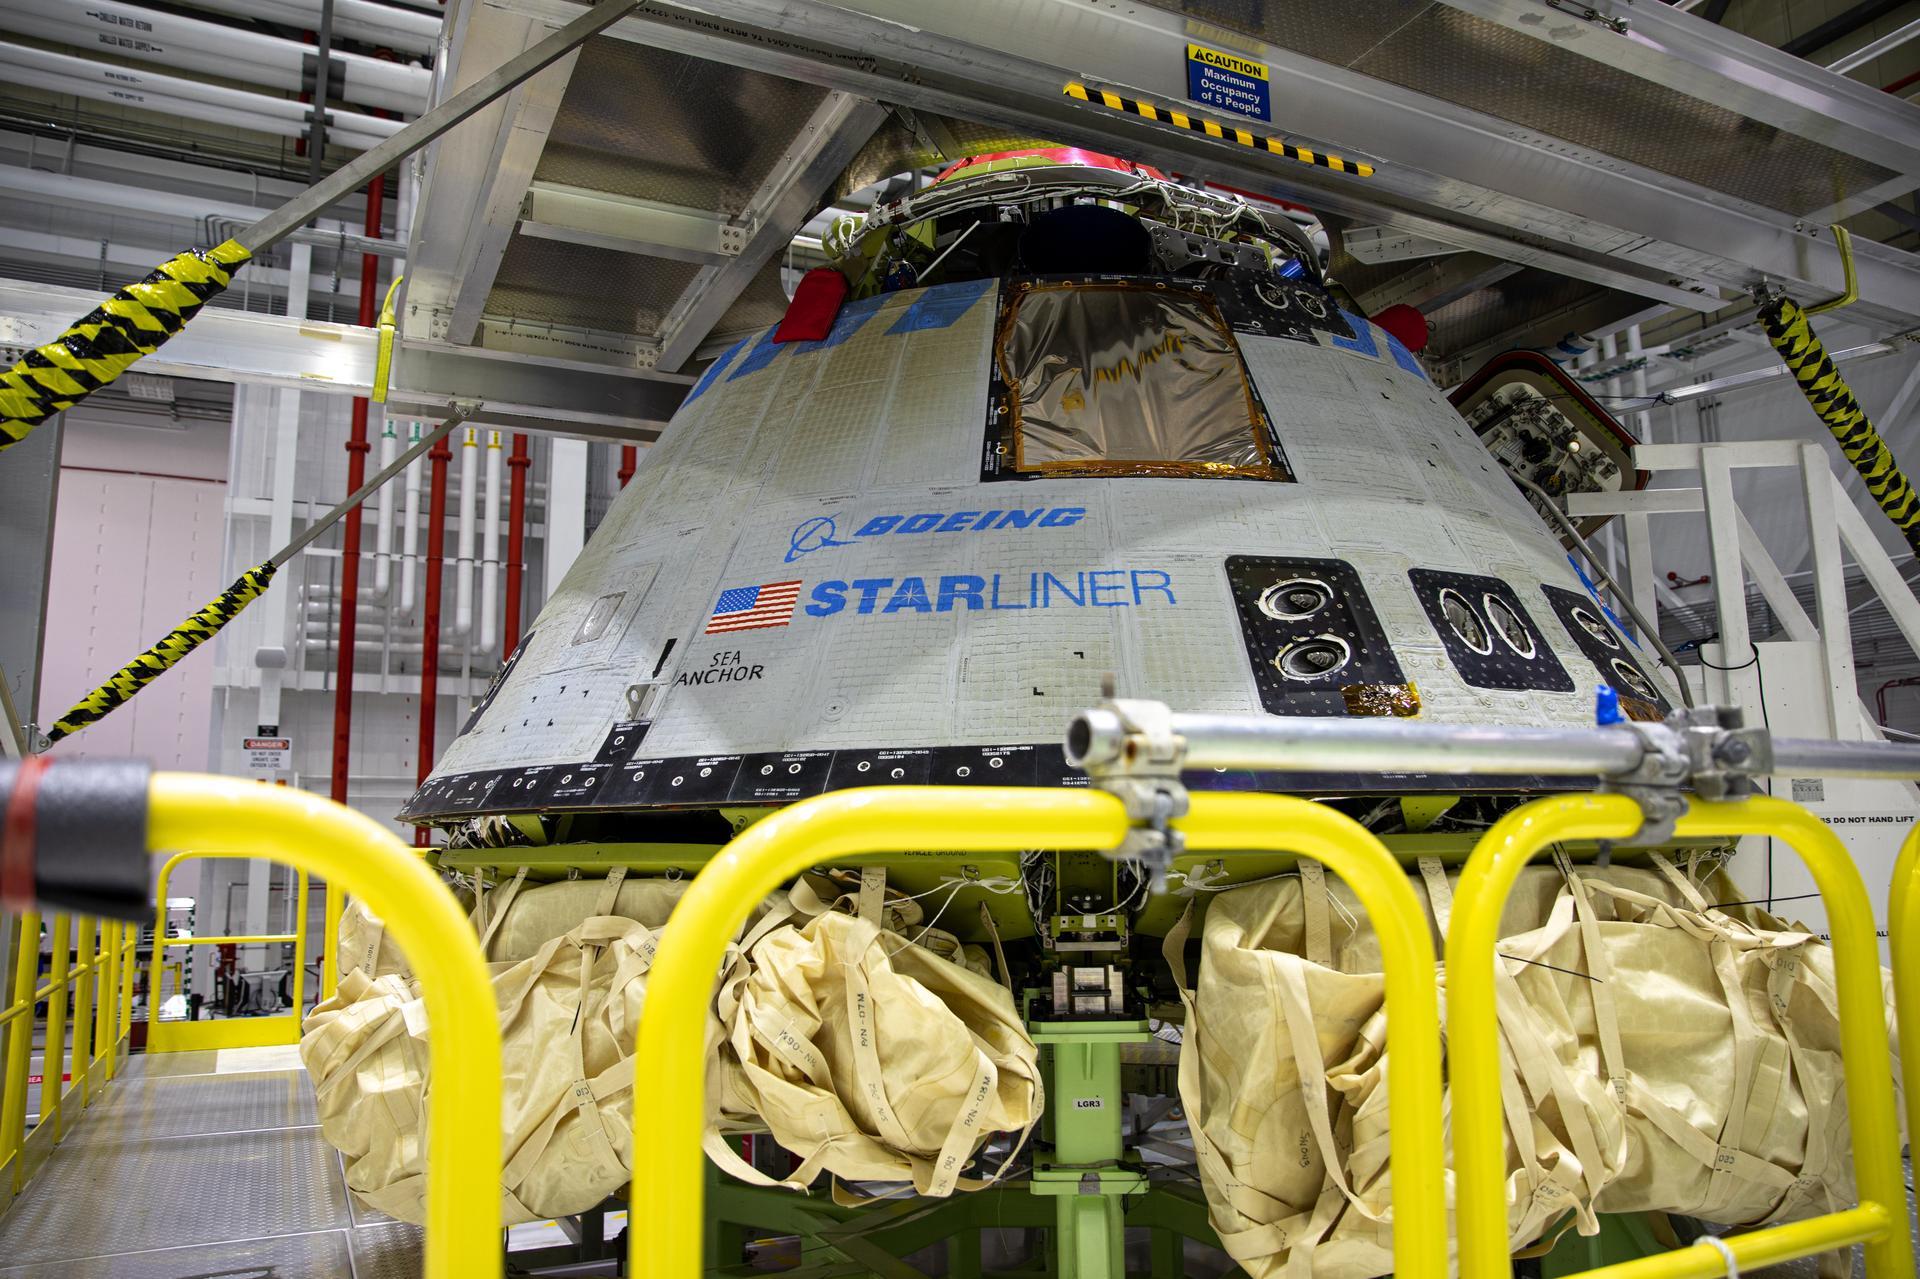 NASA and Boeing Complete Starliner Orbital Flight Test Investigation